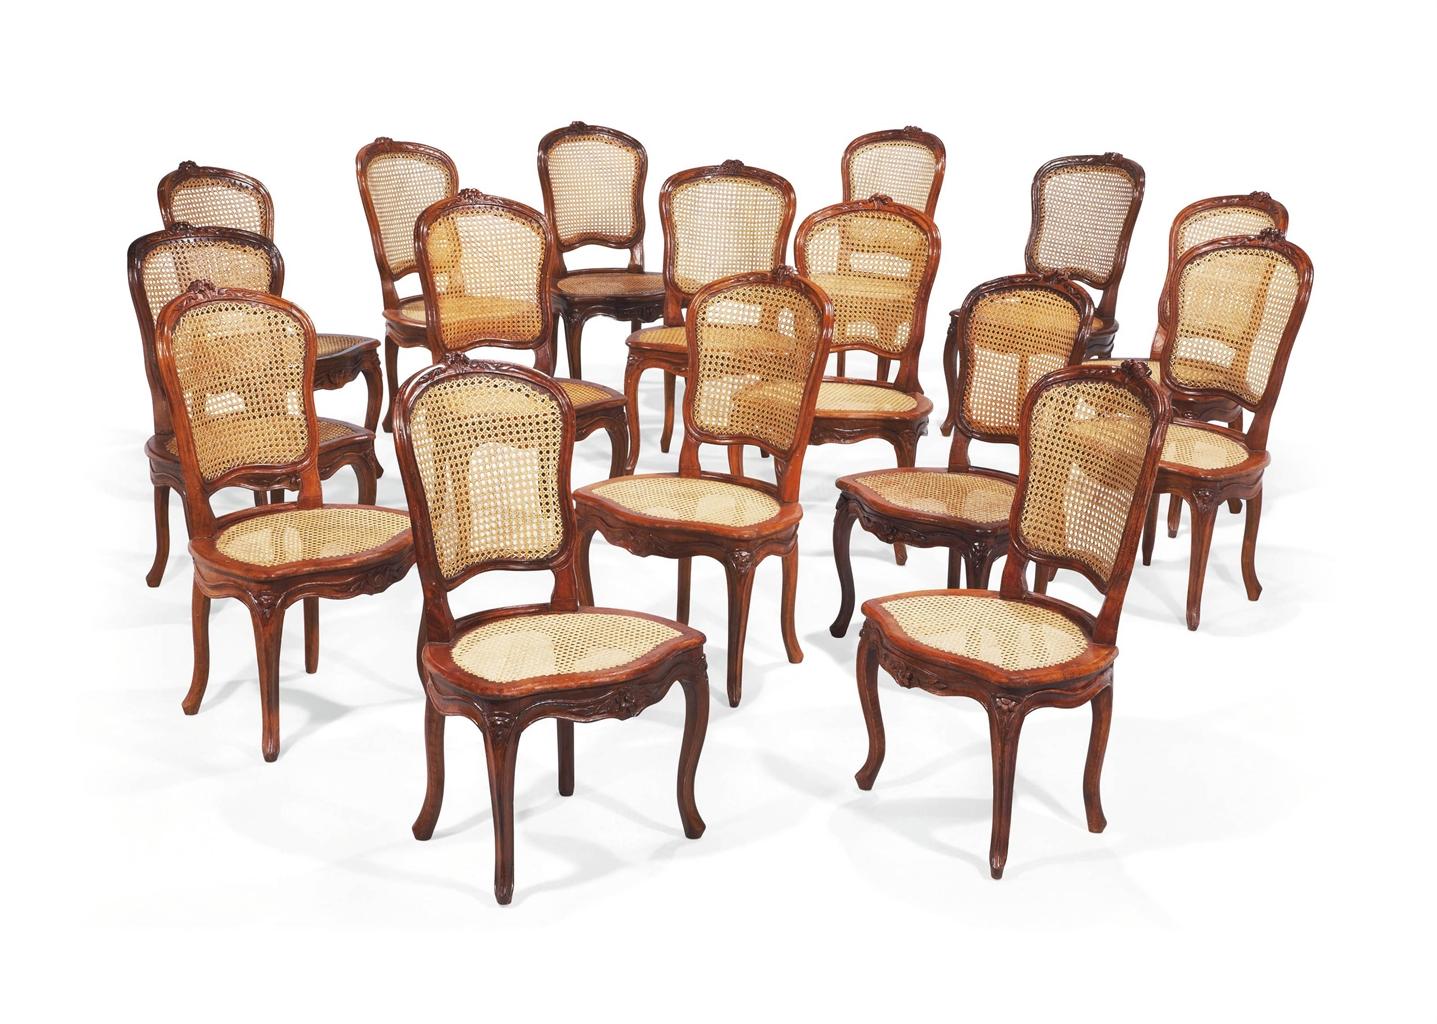 Chaise de salle a manger alinea used honda f6b for sale for Chaises salle a manger alinea